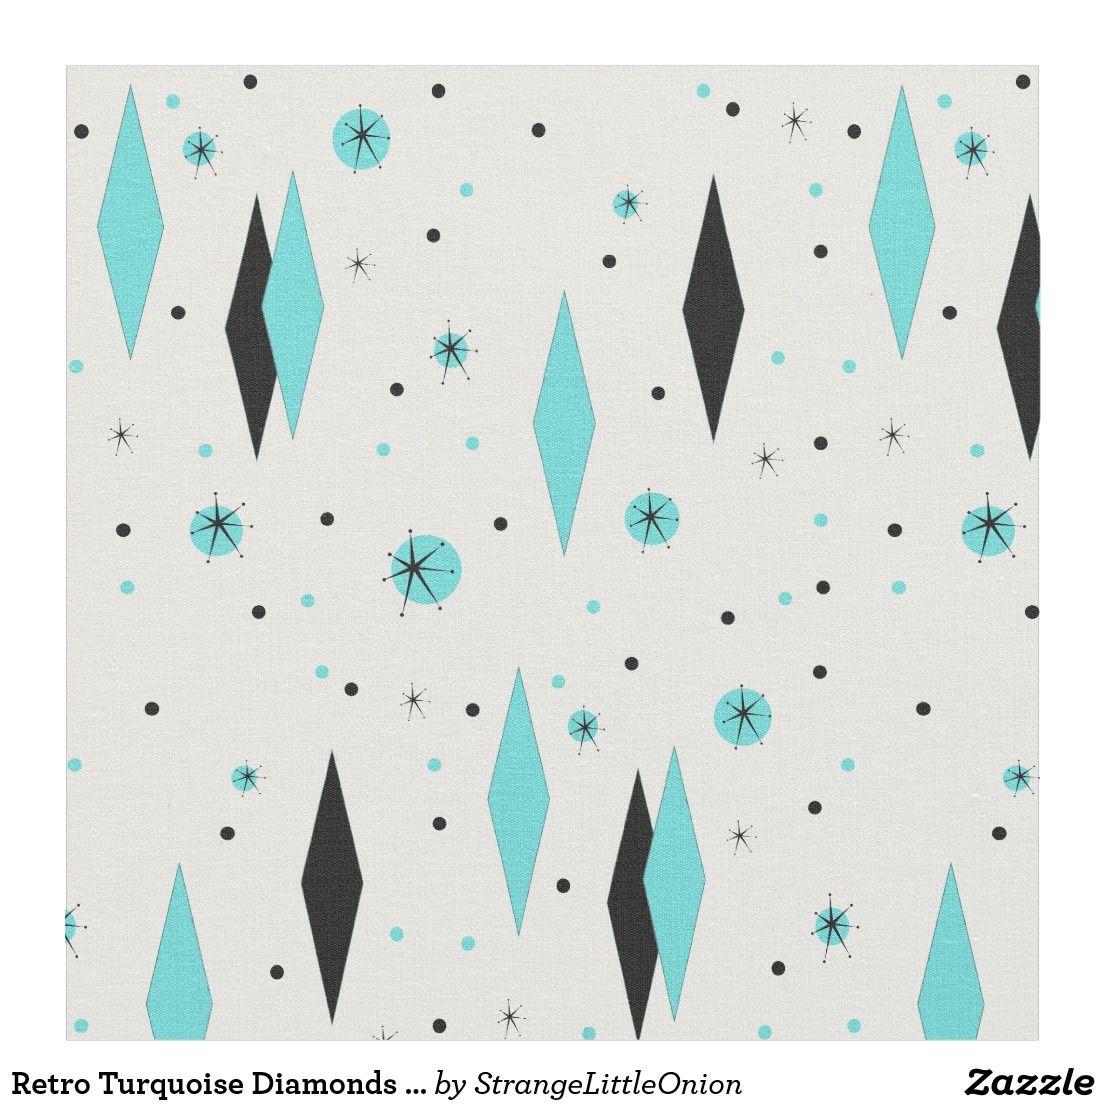 Retro Turquoise Diamonds And Starbursts Fabric